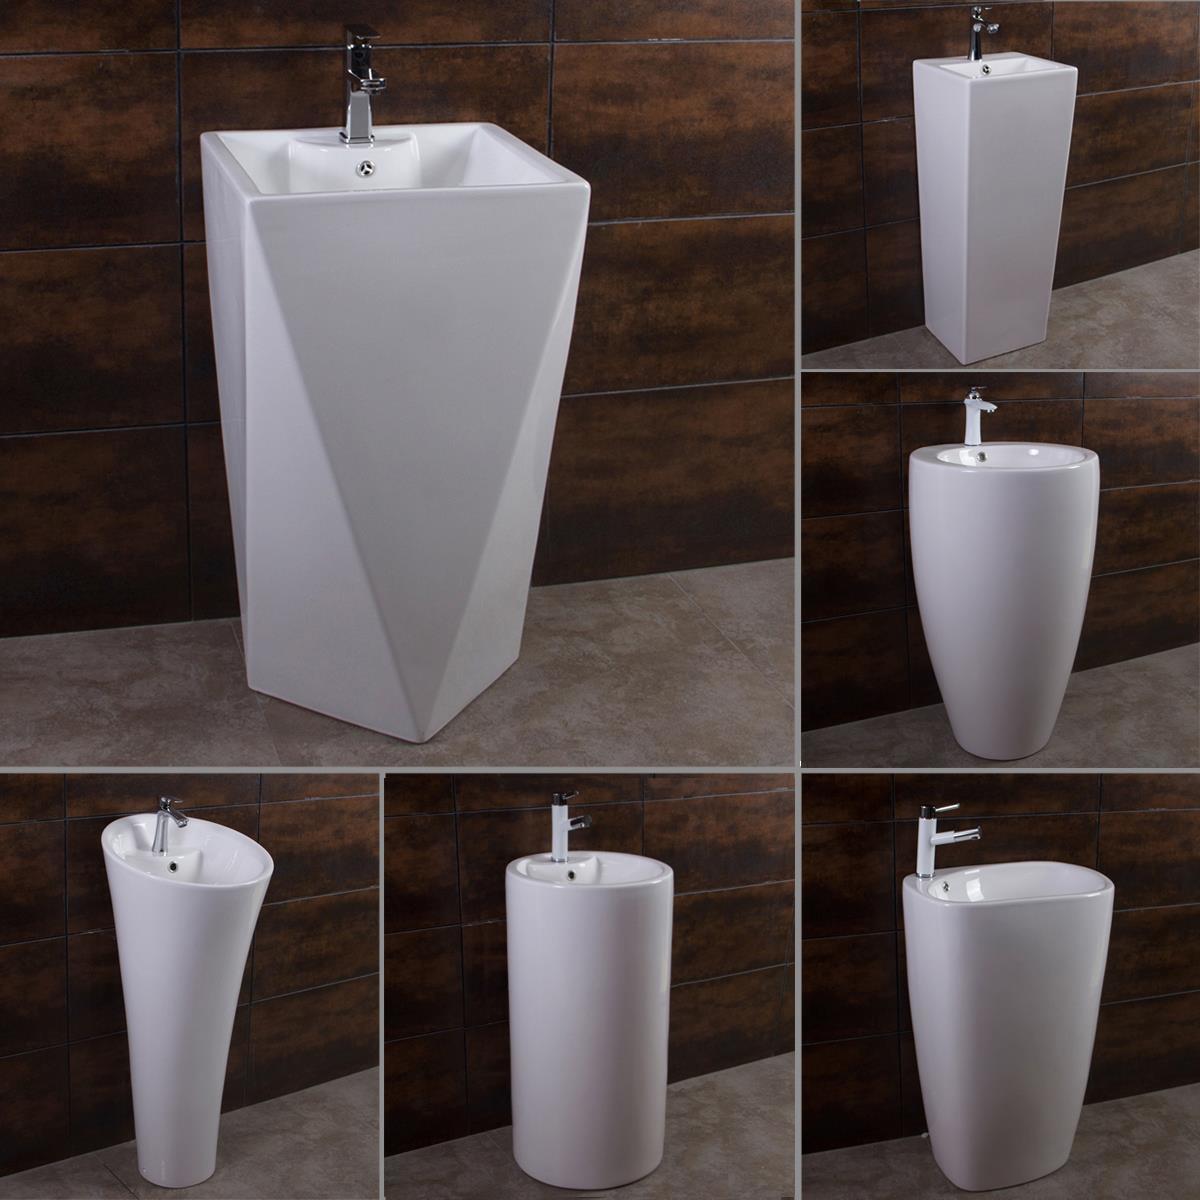 Mobel Salle De Bain us $236.11 23% off|umywalka bassin fregadero salle bain de para da appoggio  banyo waschtisch bathroom basin lavabo sink cuba pia banheiro washbasin-in